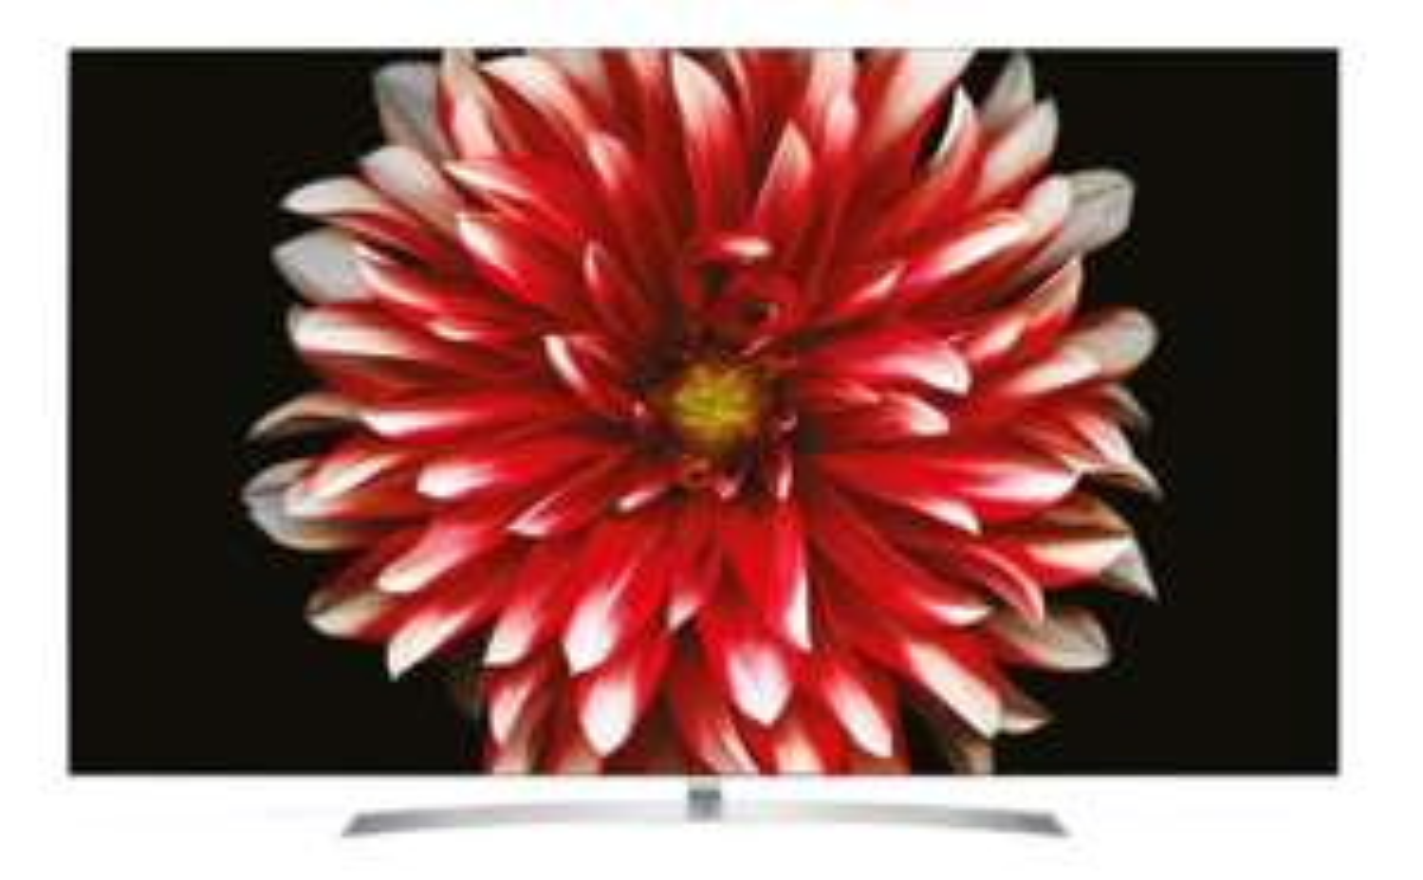 LG OLED65B7D 164 cm (65 Zoll, OLED) Fernseher (Ultra HD) für 1749,17€ (Bestpreis)